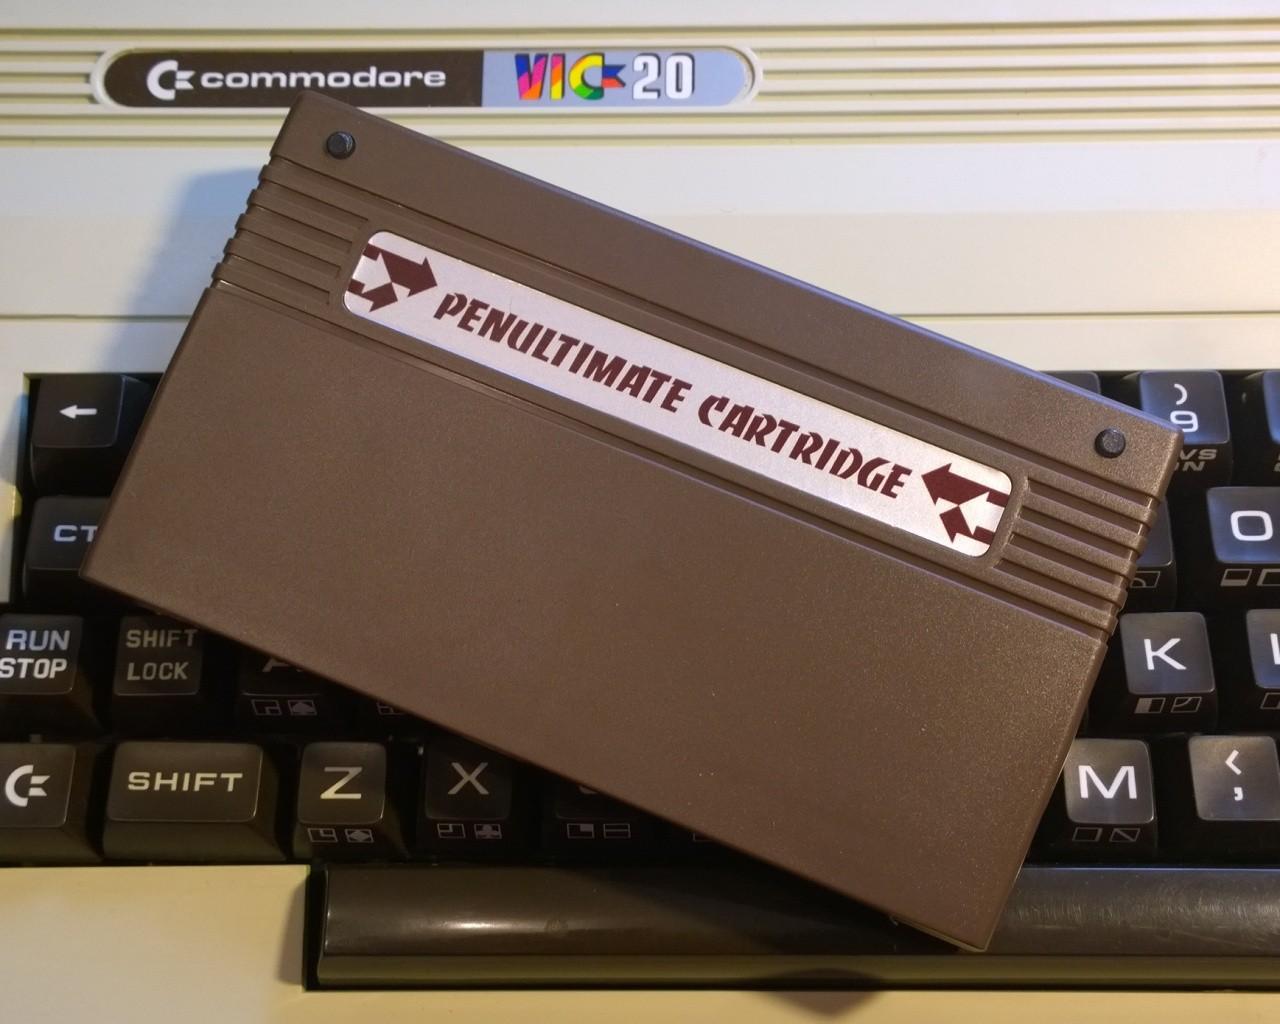 Penultimate Cartridge VIC20 Memory Expansion + ROMS